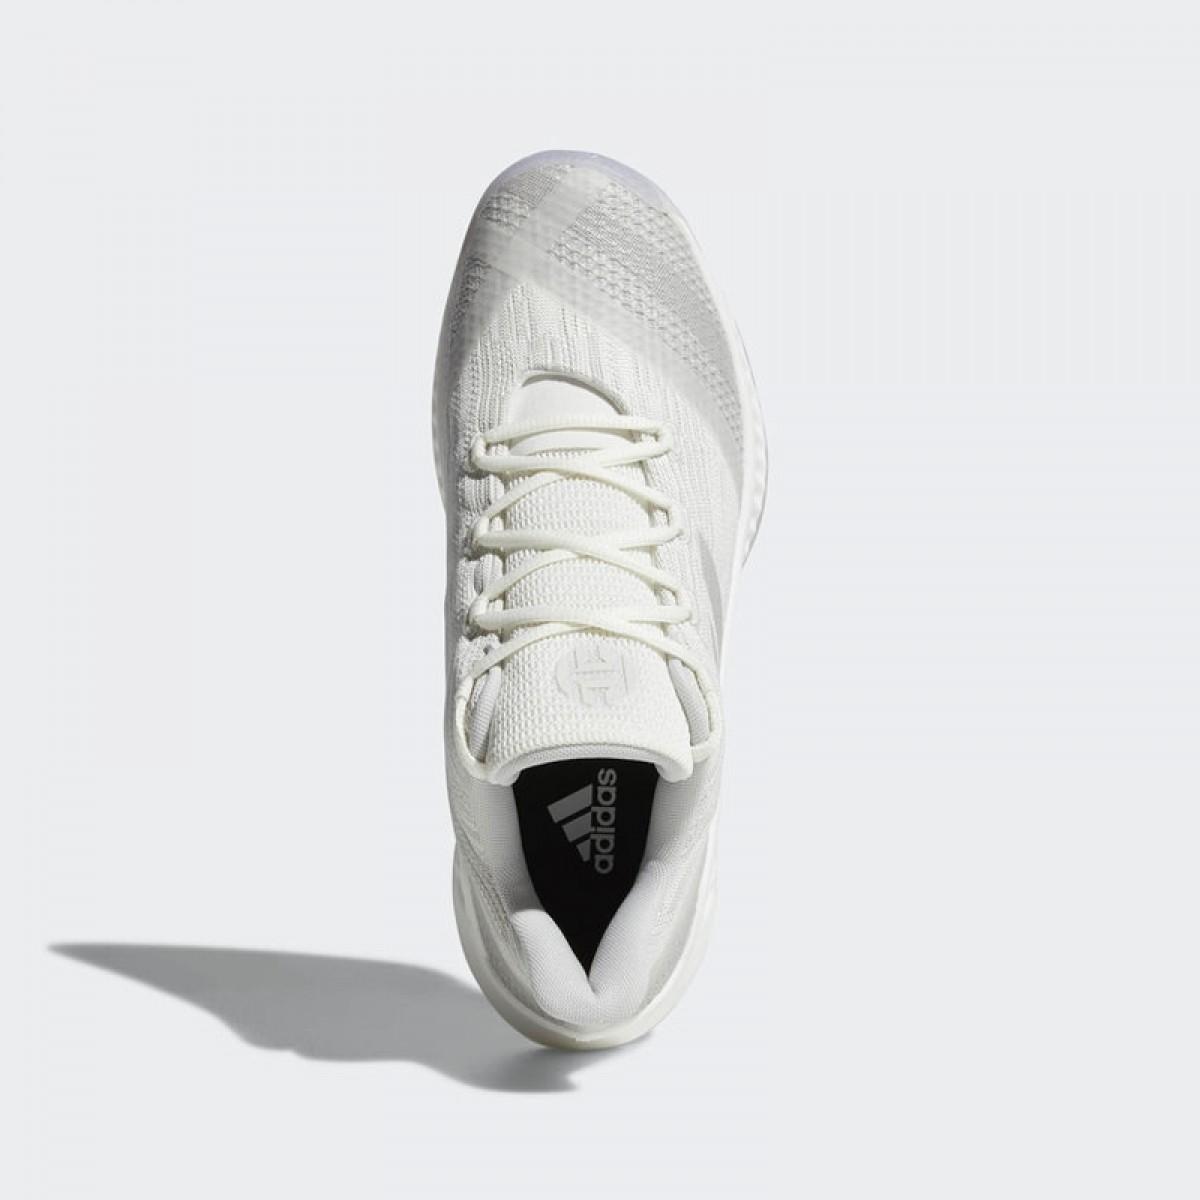 ADIDAS Harden B/E 2 'White' AQ0033